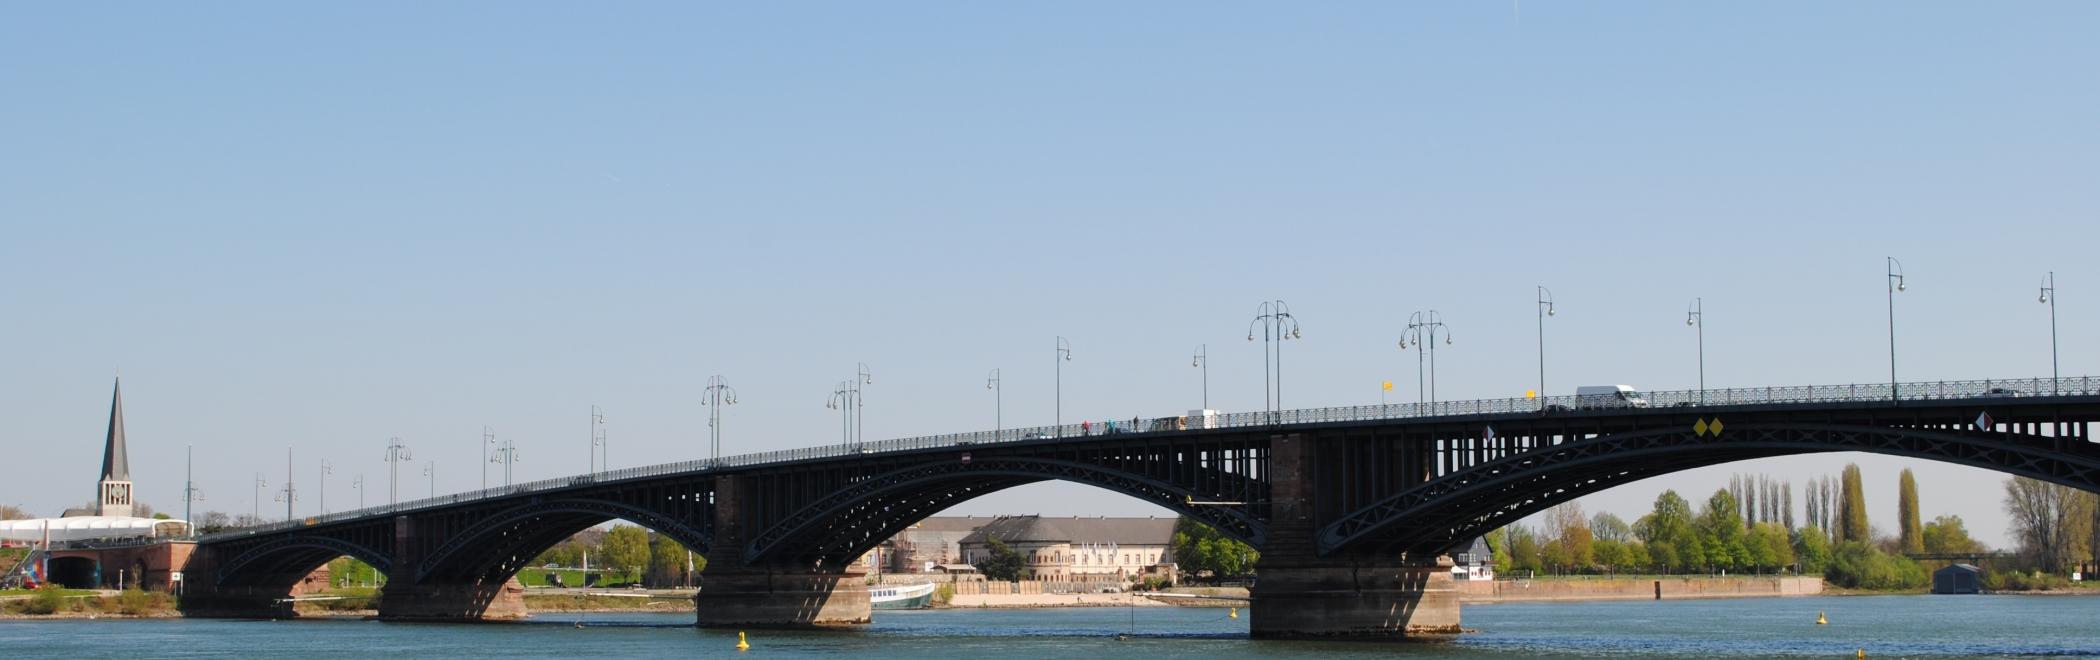 Rhein Dom Theodor Heuss Brücke